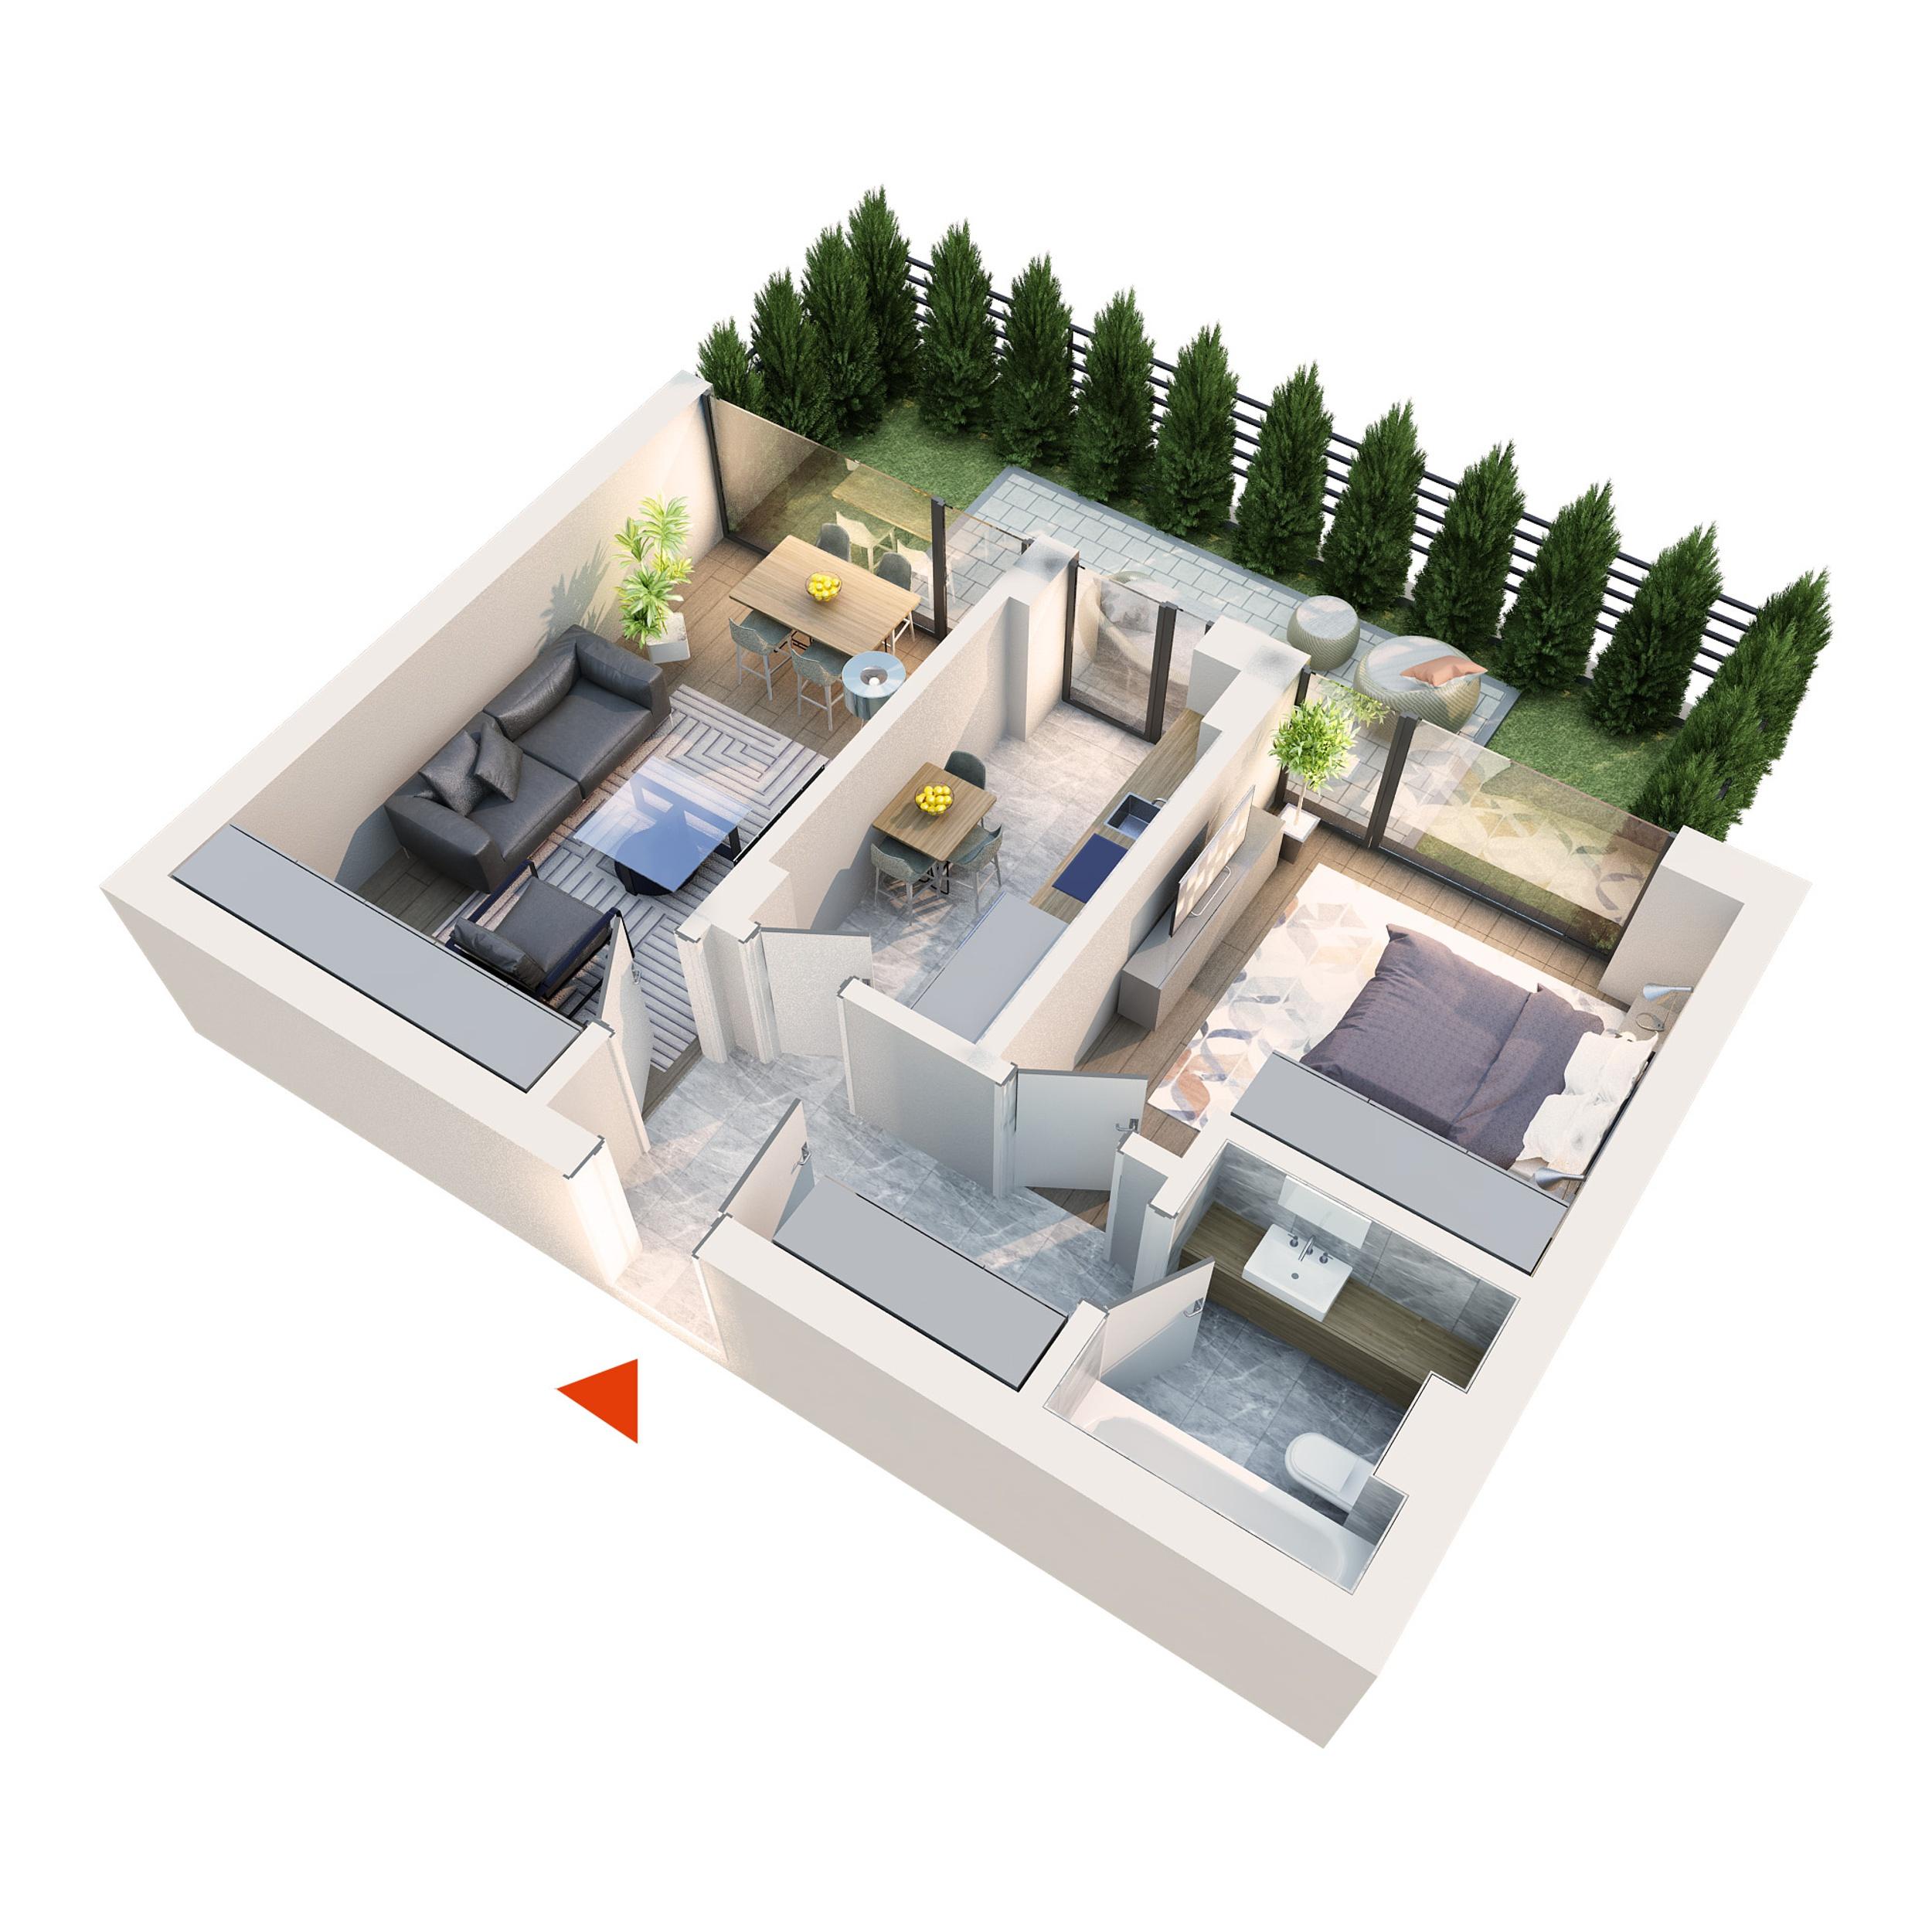 Apartament 2 camere tip 2A1 gradina | Parter | Corp C1 – C6 | Faza 2